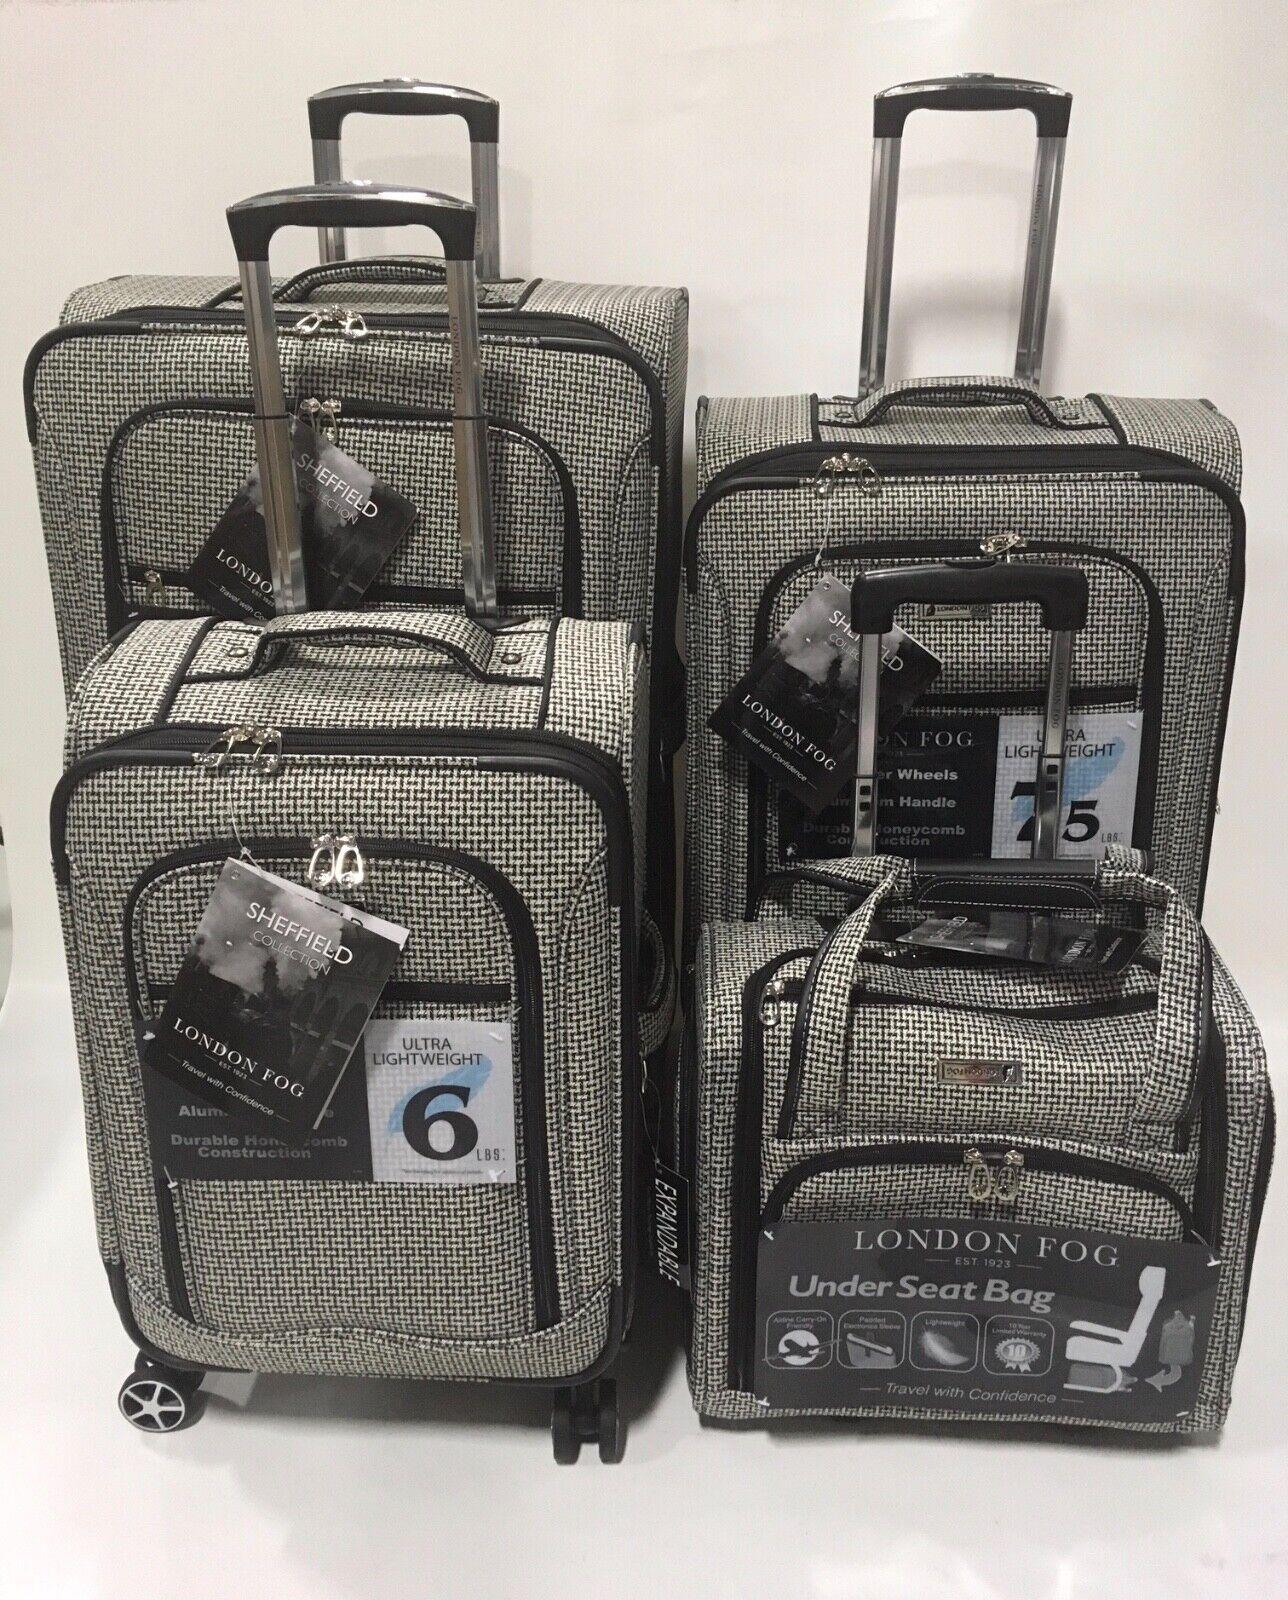 London Fog Sheffield 4pc Light Luggage Set Expandable Black White Square For Sale Online Ebay